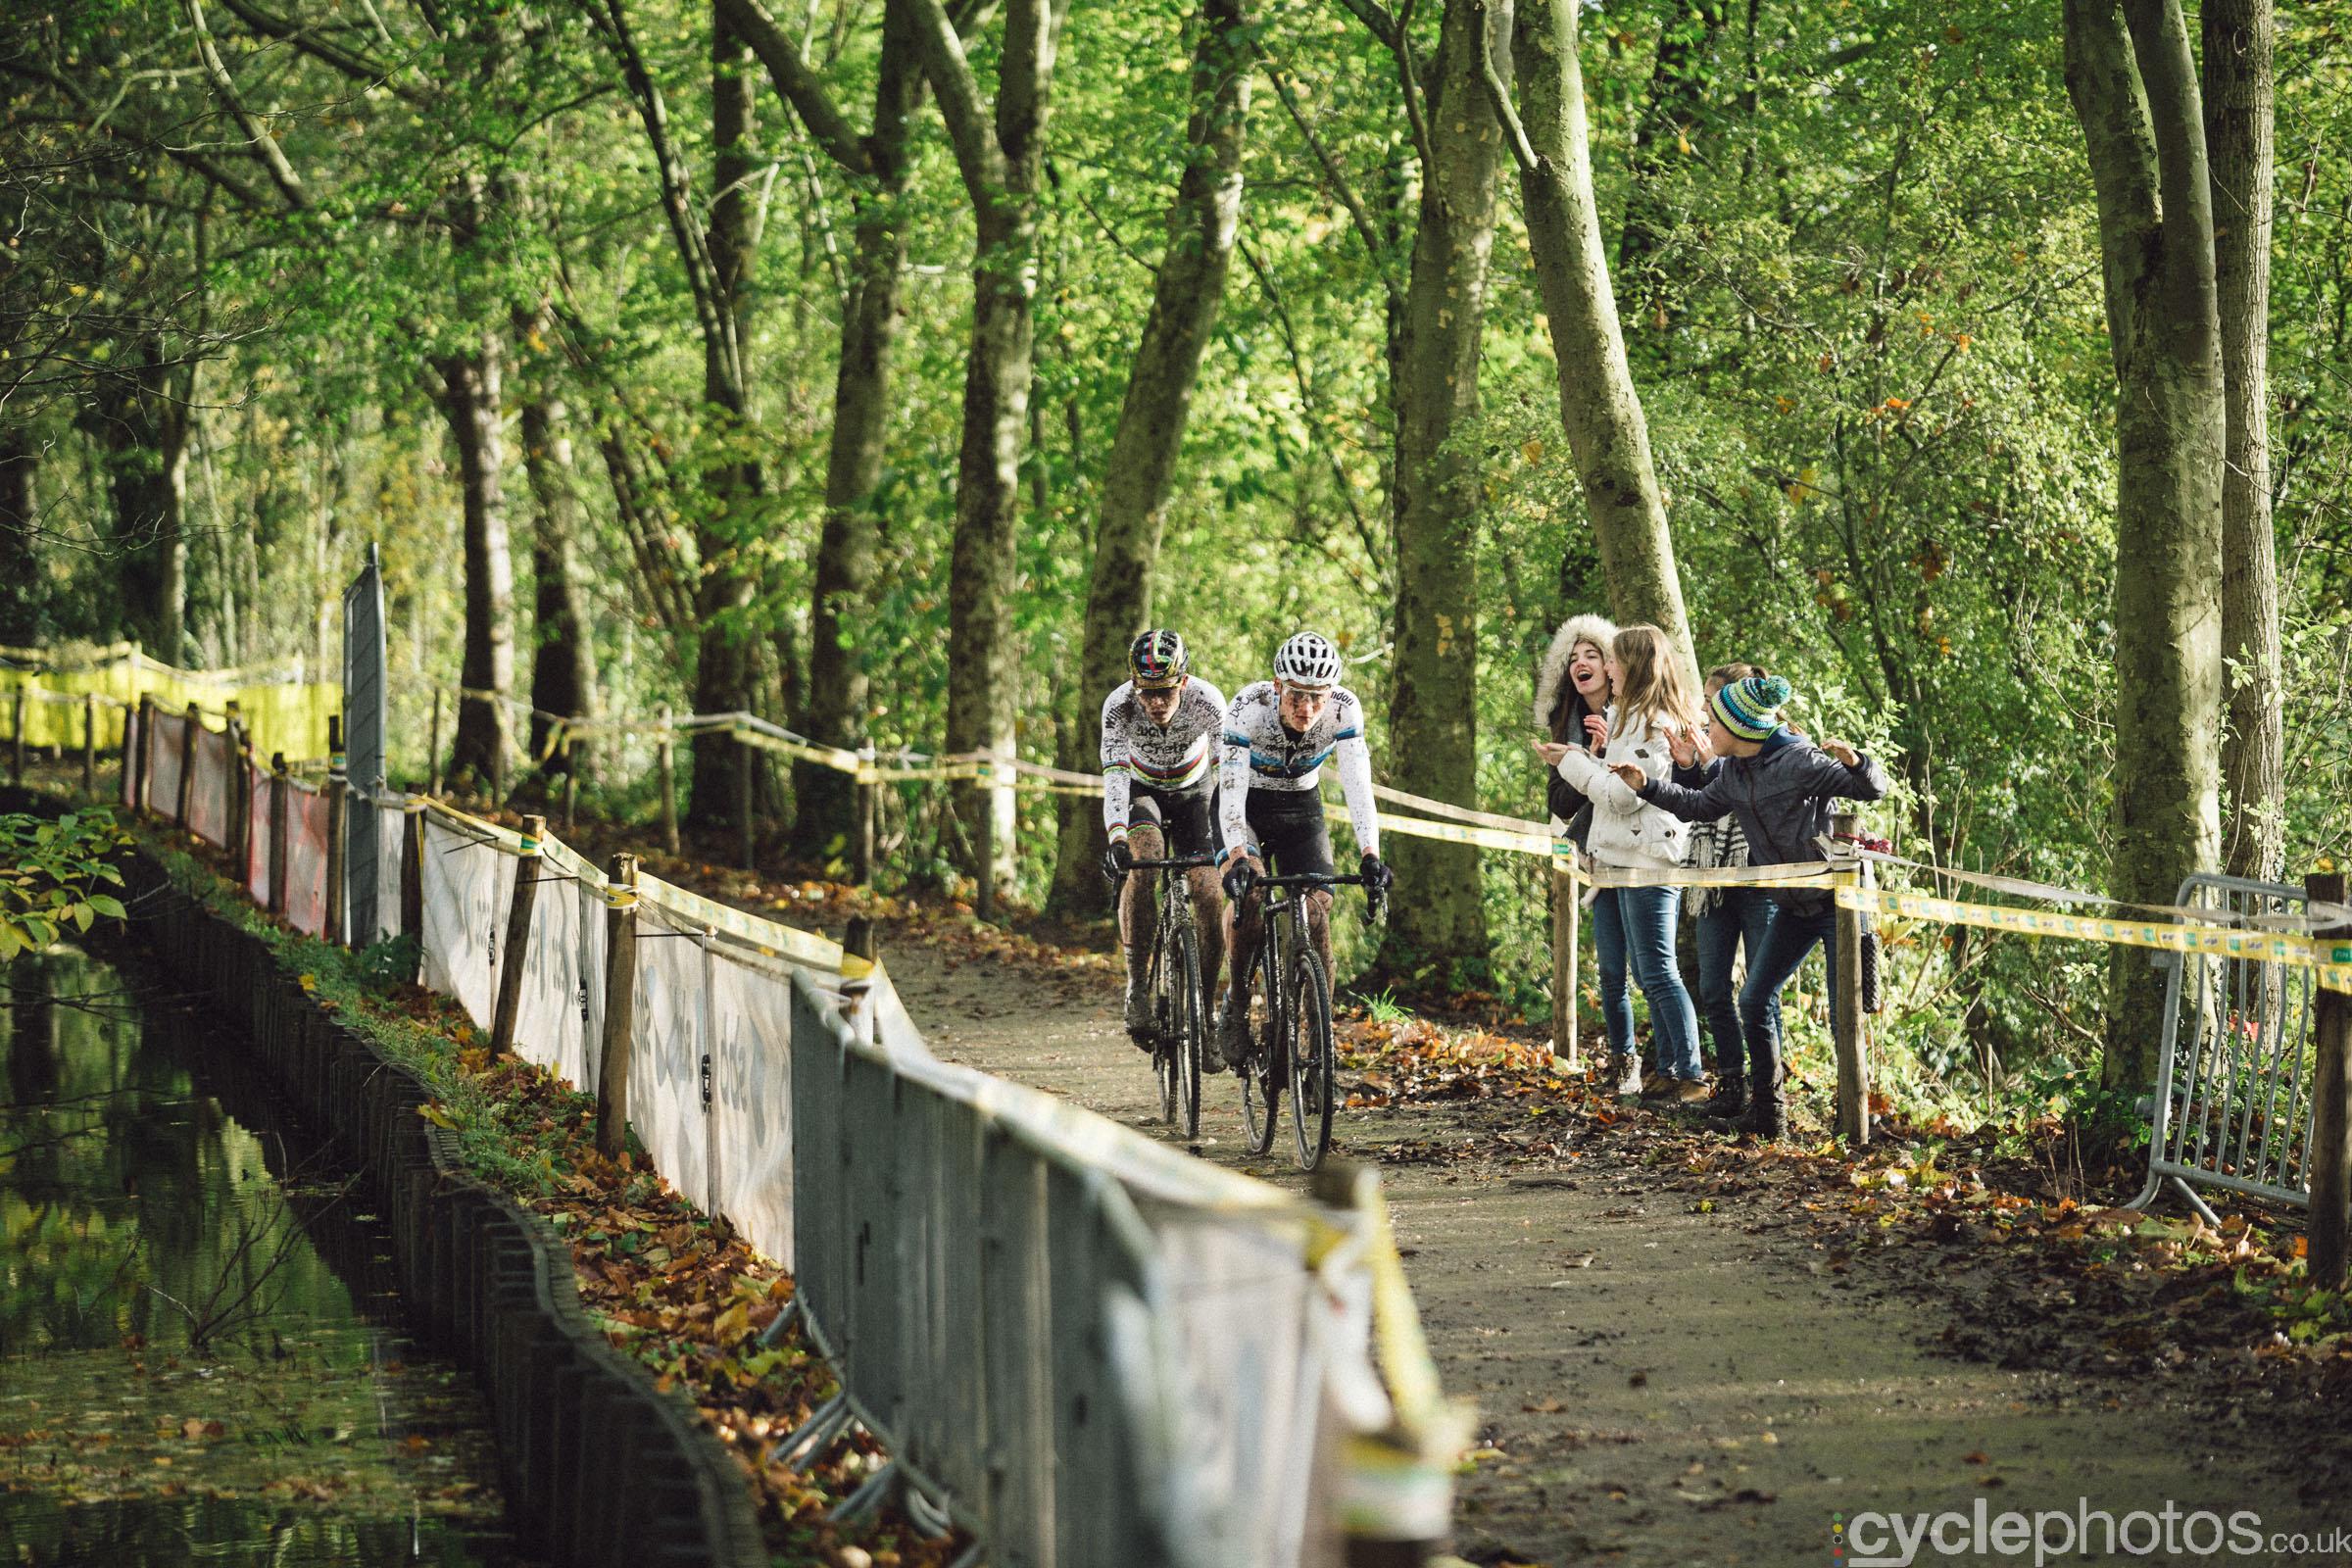 Mathieu van der Poel at Cyclocross Superprestige #5 - Gavere, BEL